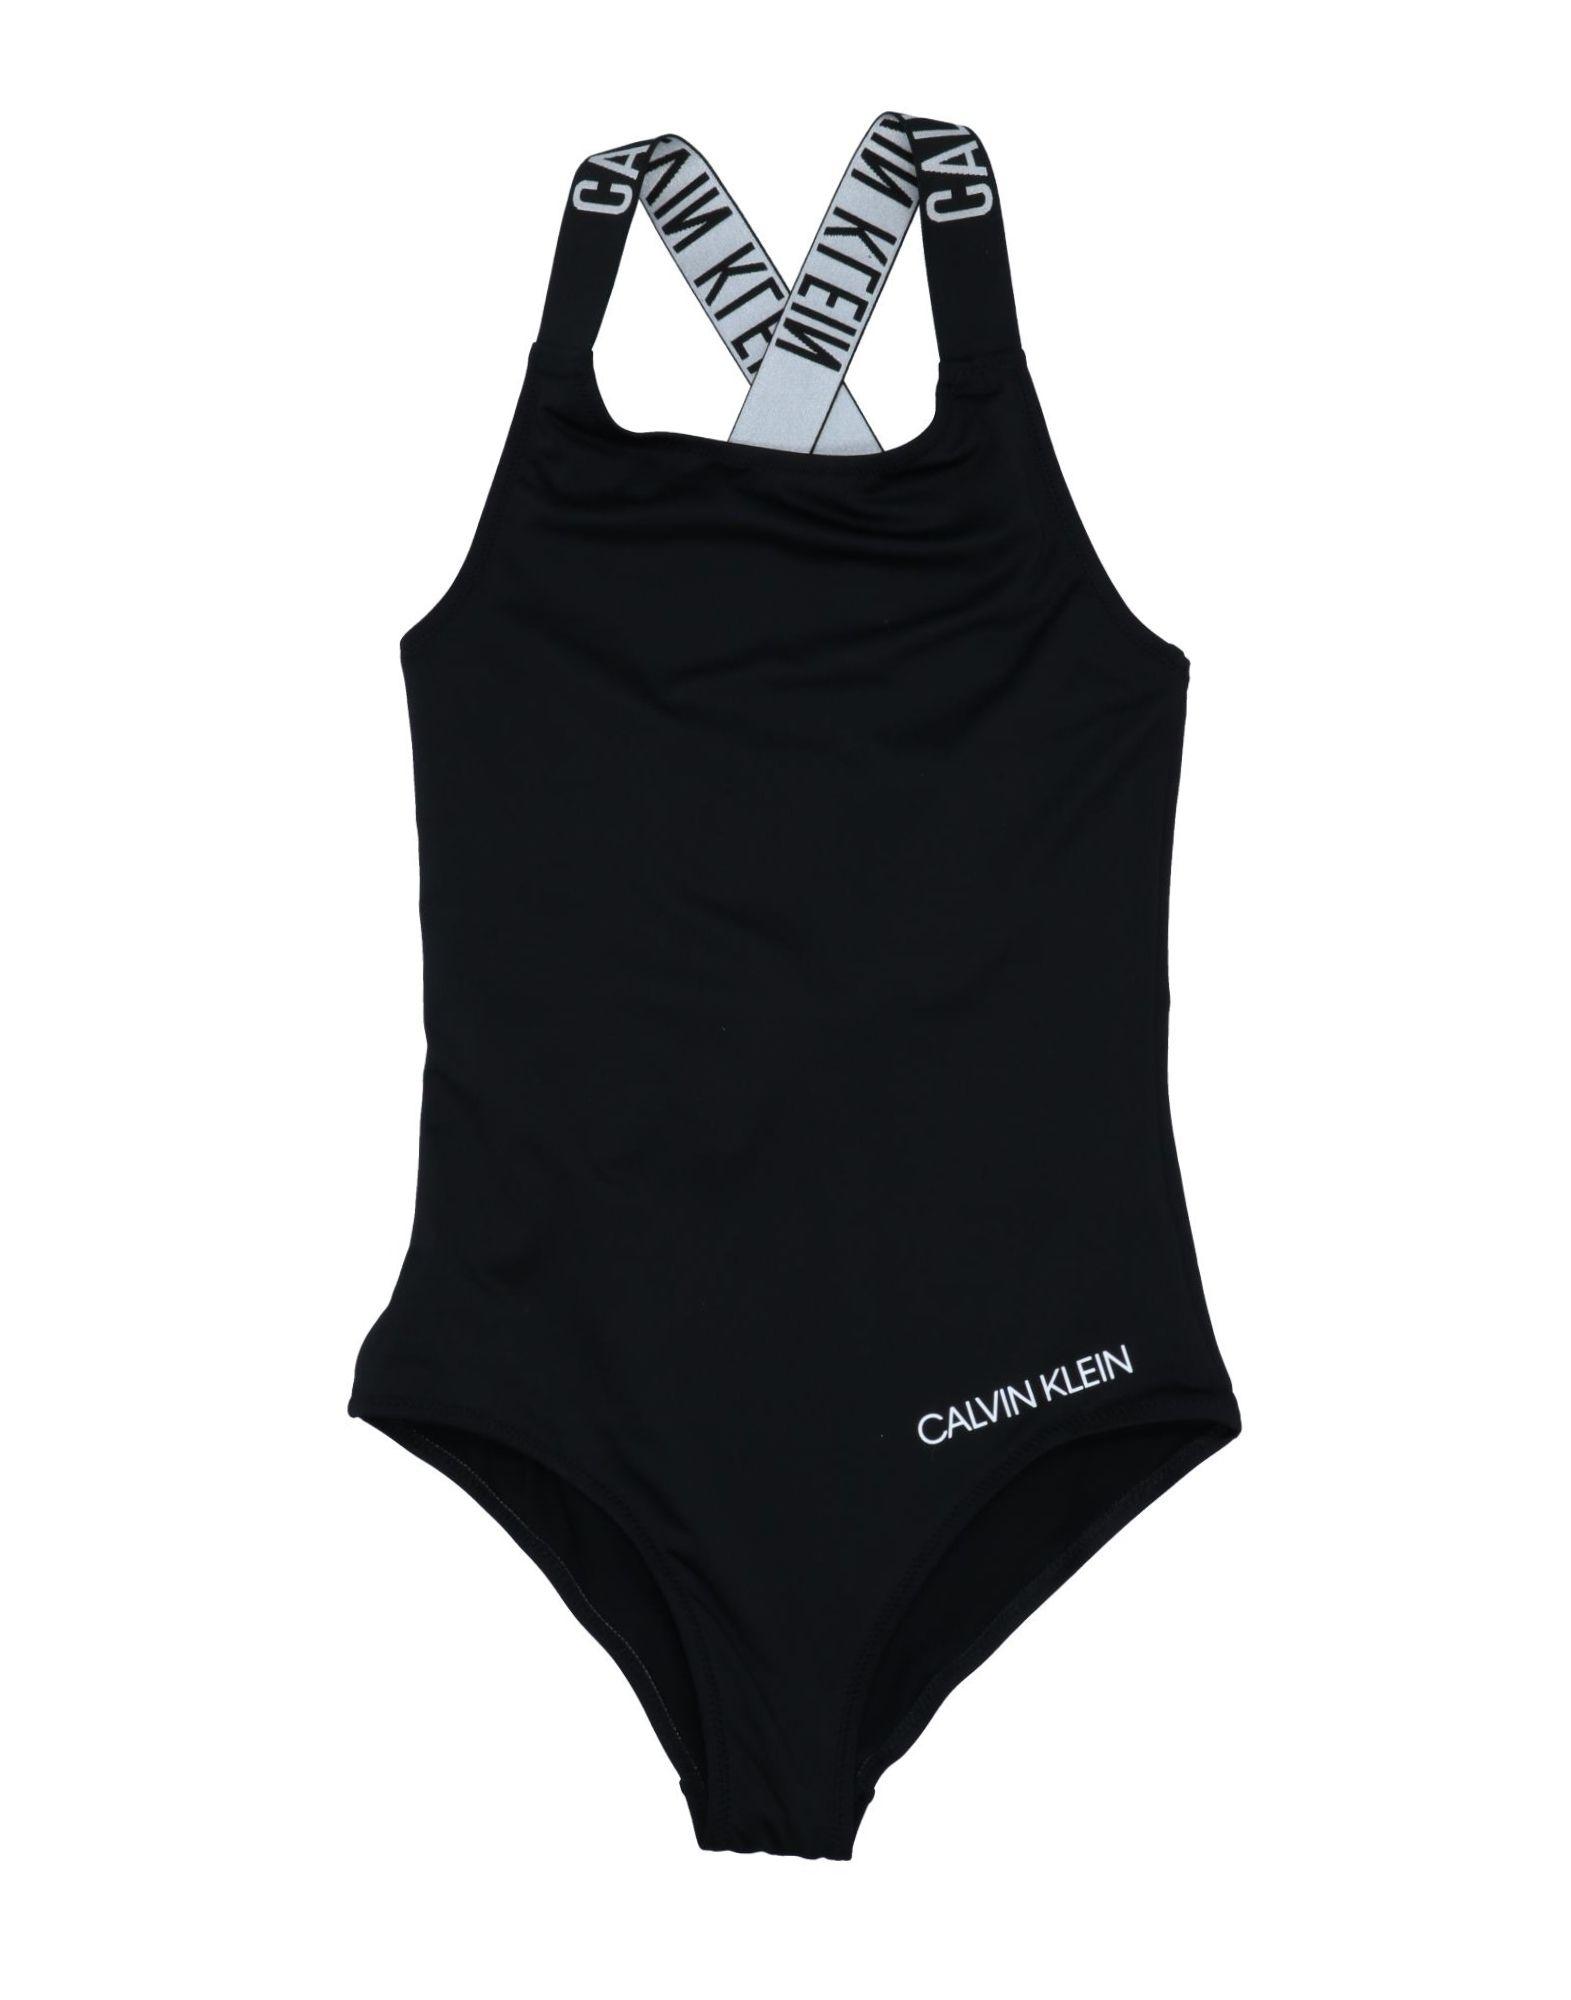 CALVIN KLEIN   CALVIN KLEIN One-Piece Swimsuits 47247852   Goxip